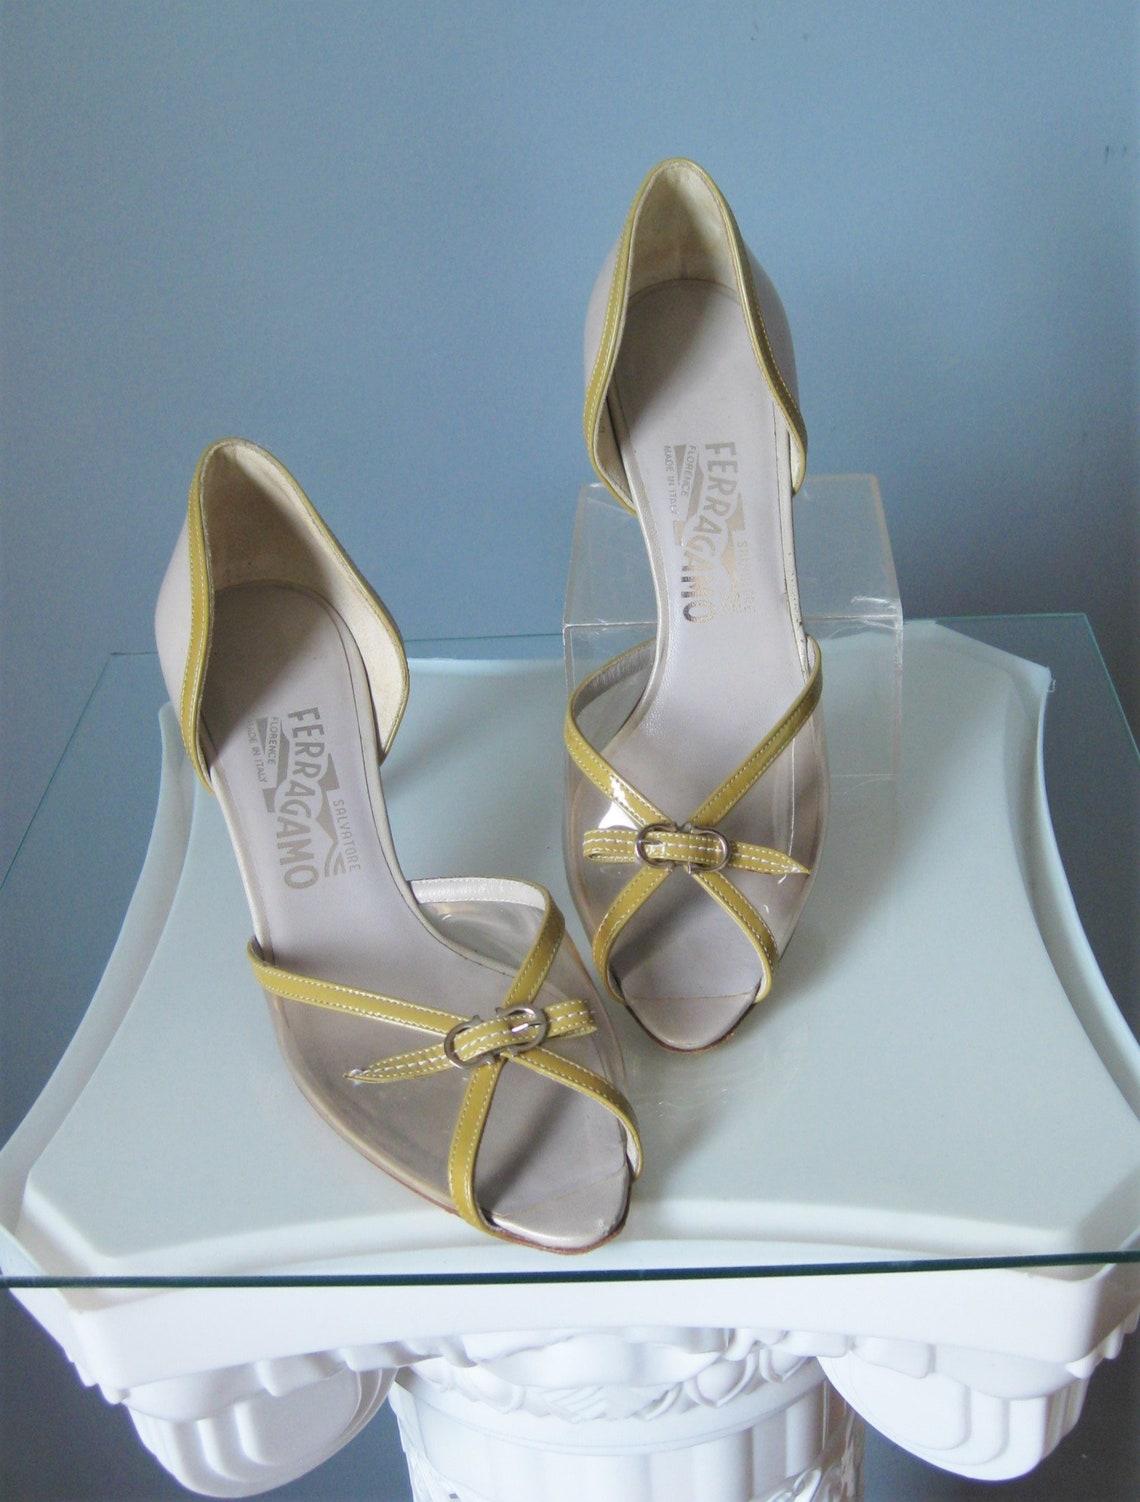 Ferragamo Peeptoes / Vtg / Classic D'Orsay Style Ferragamo Clear Dove Leather / Size 6.5